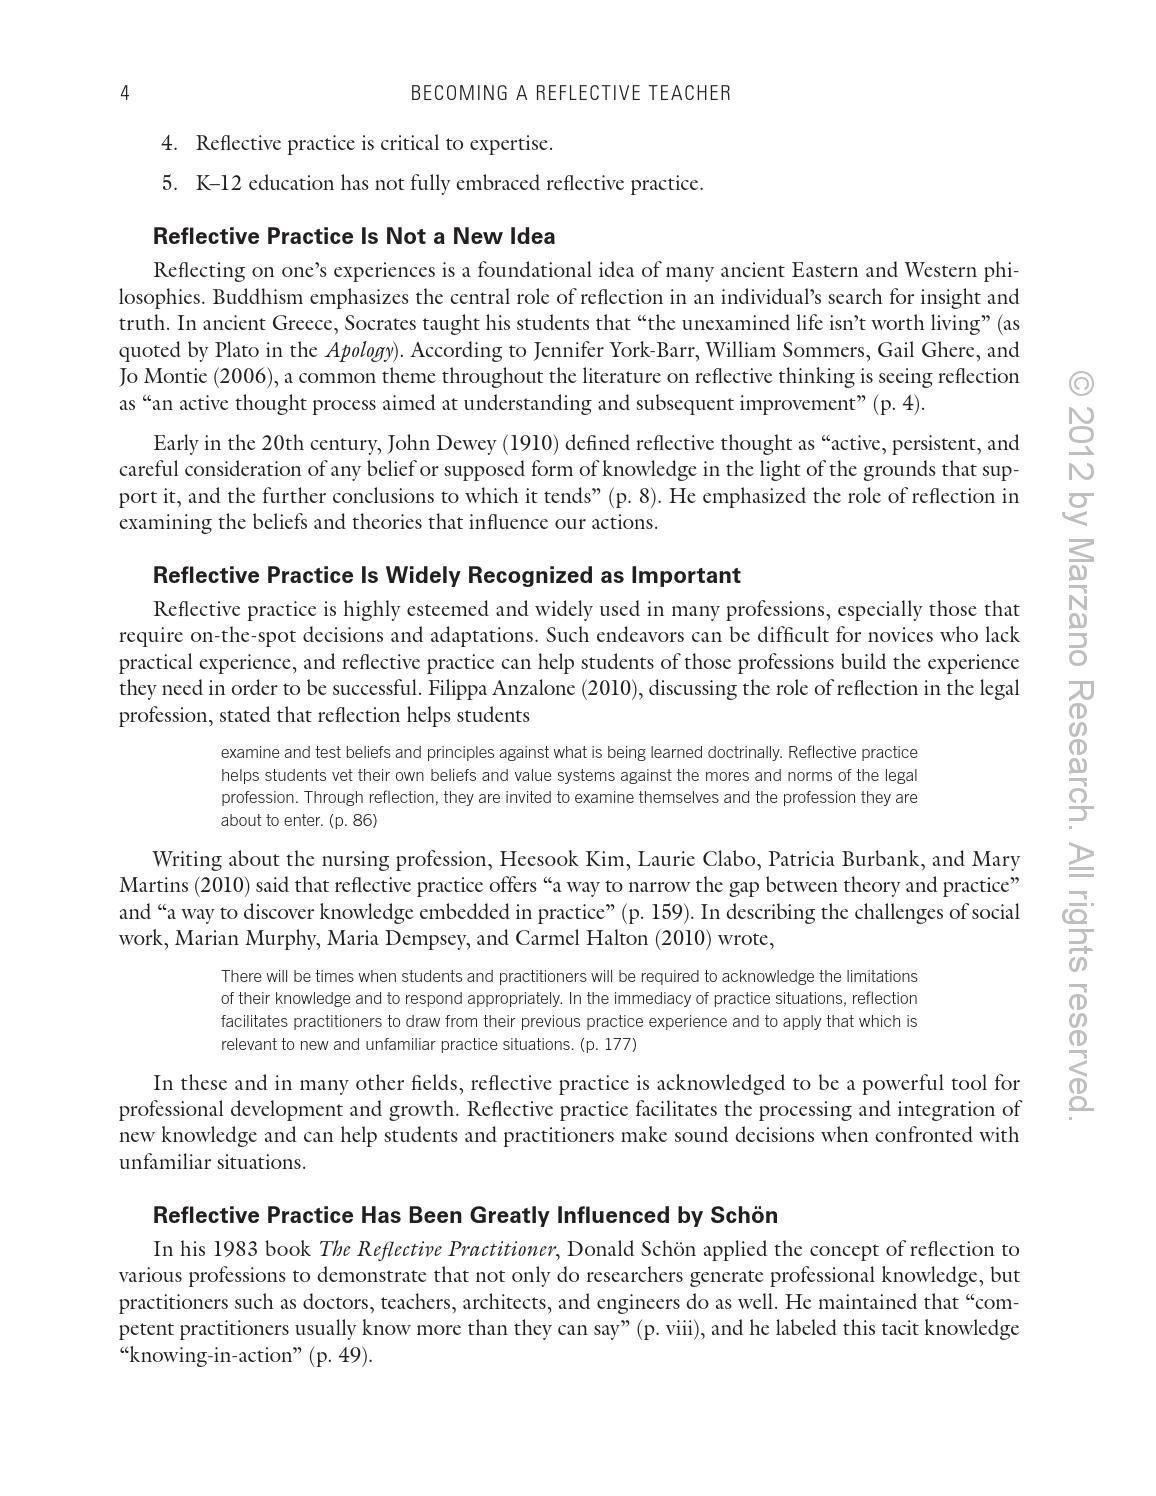 nervous system review article short cite